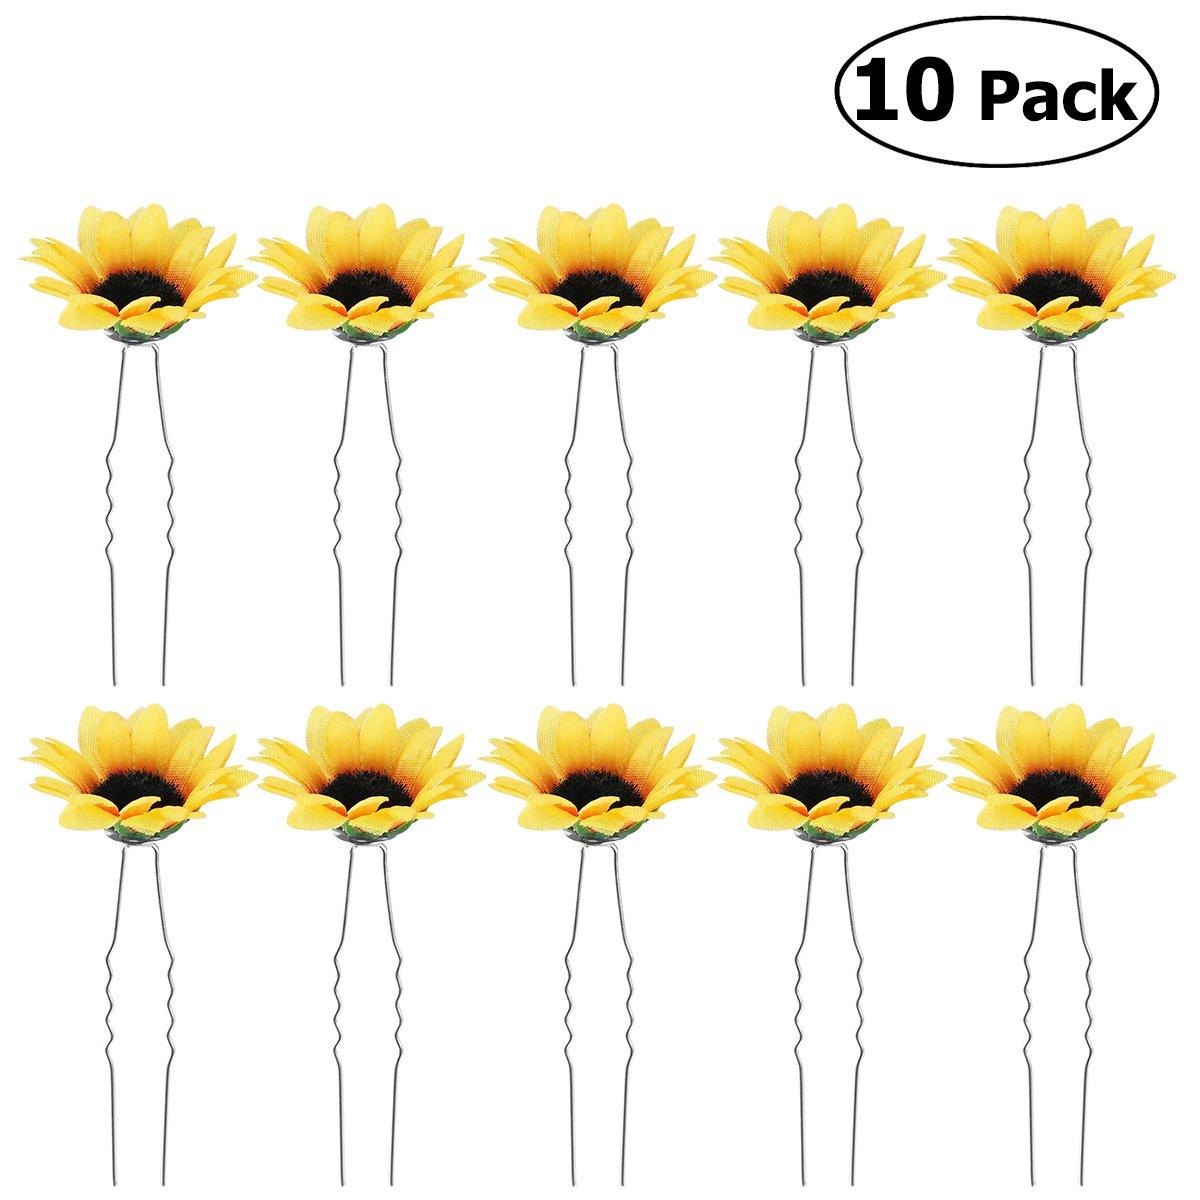 Frcolor Bridal Daisy Sunflower Hair Pins Hair Clips for Wedding,10PCS